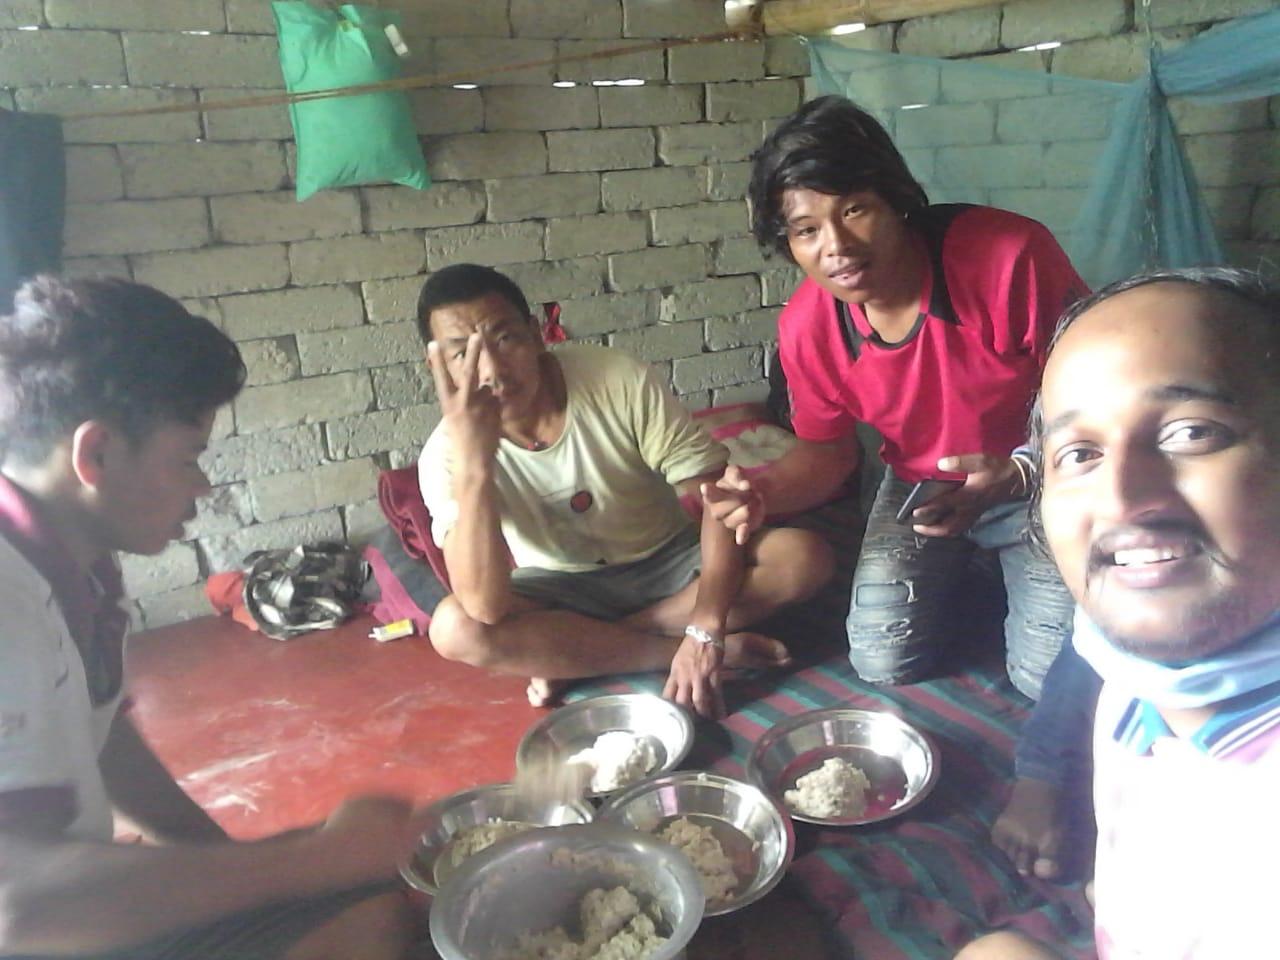 Taking Dahi chiura with Friend at Ashar 15